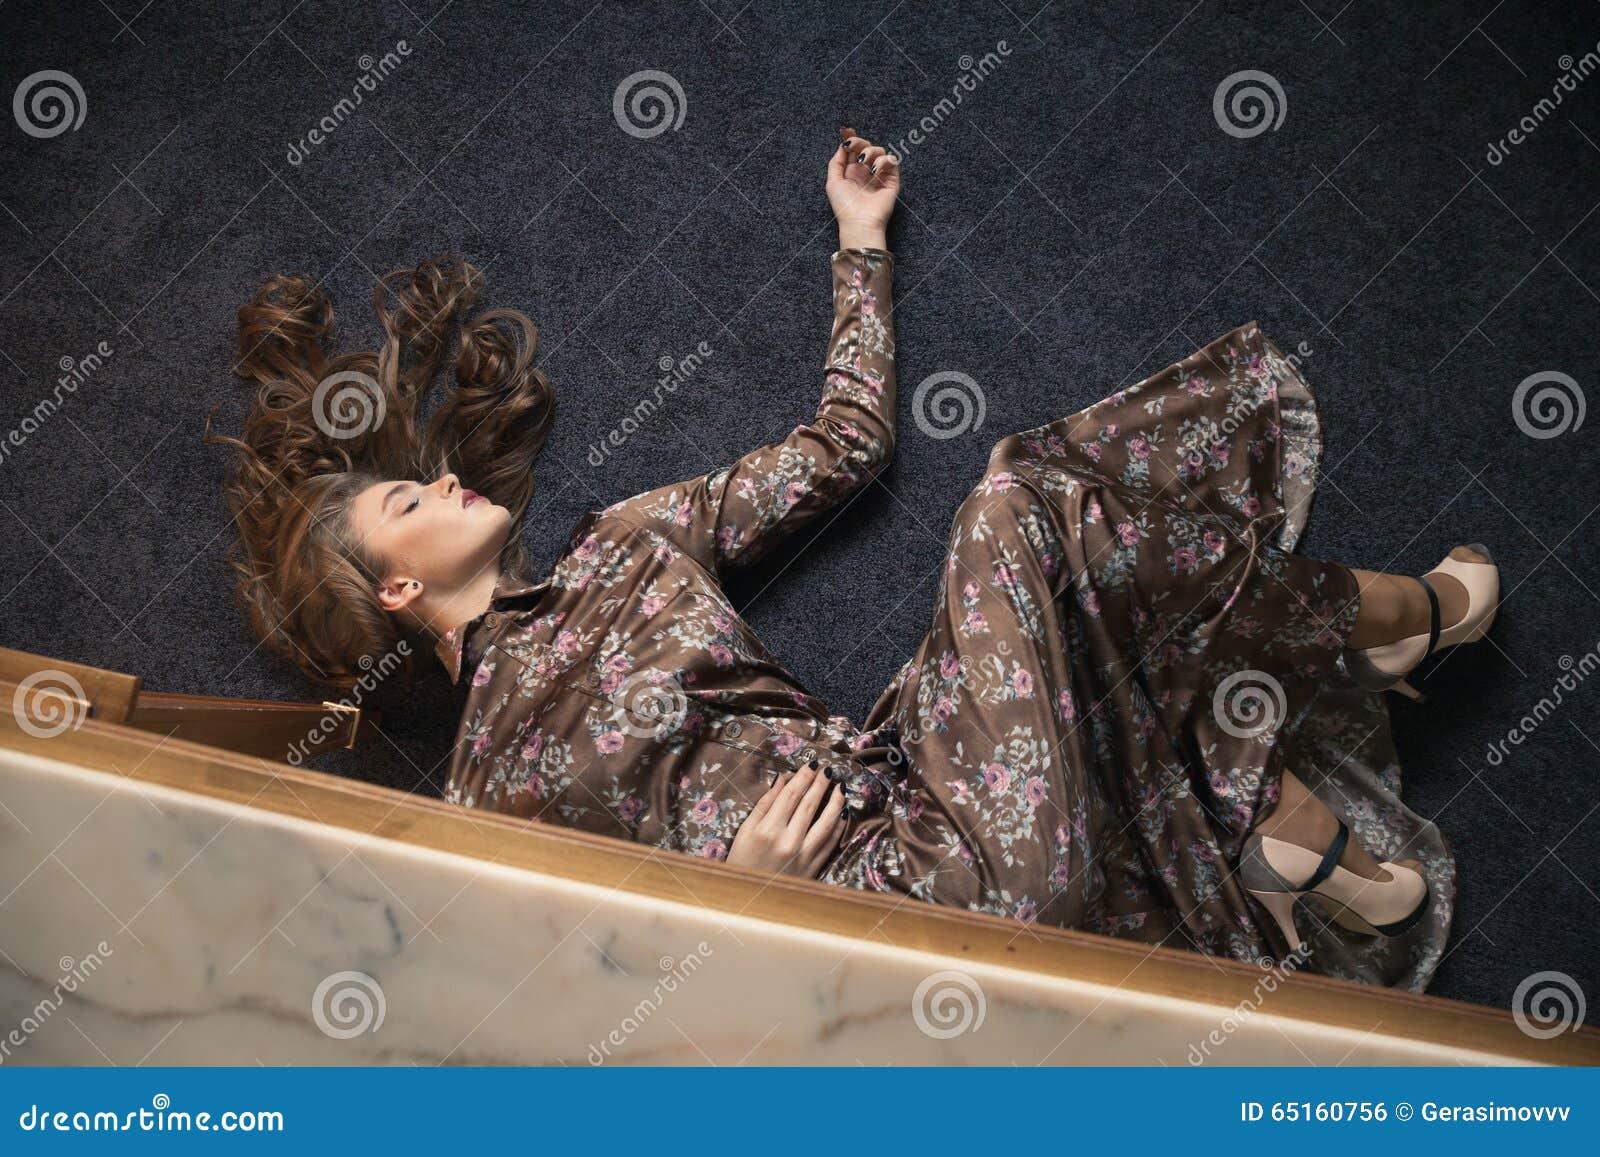 dress on the floor